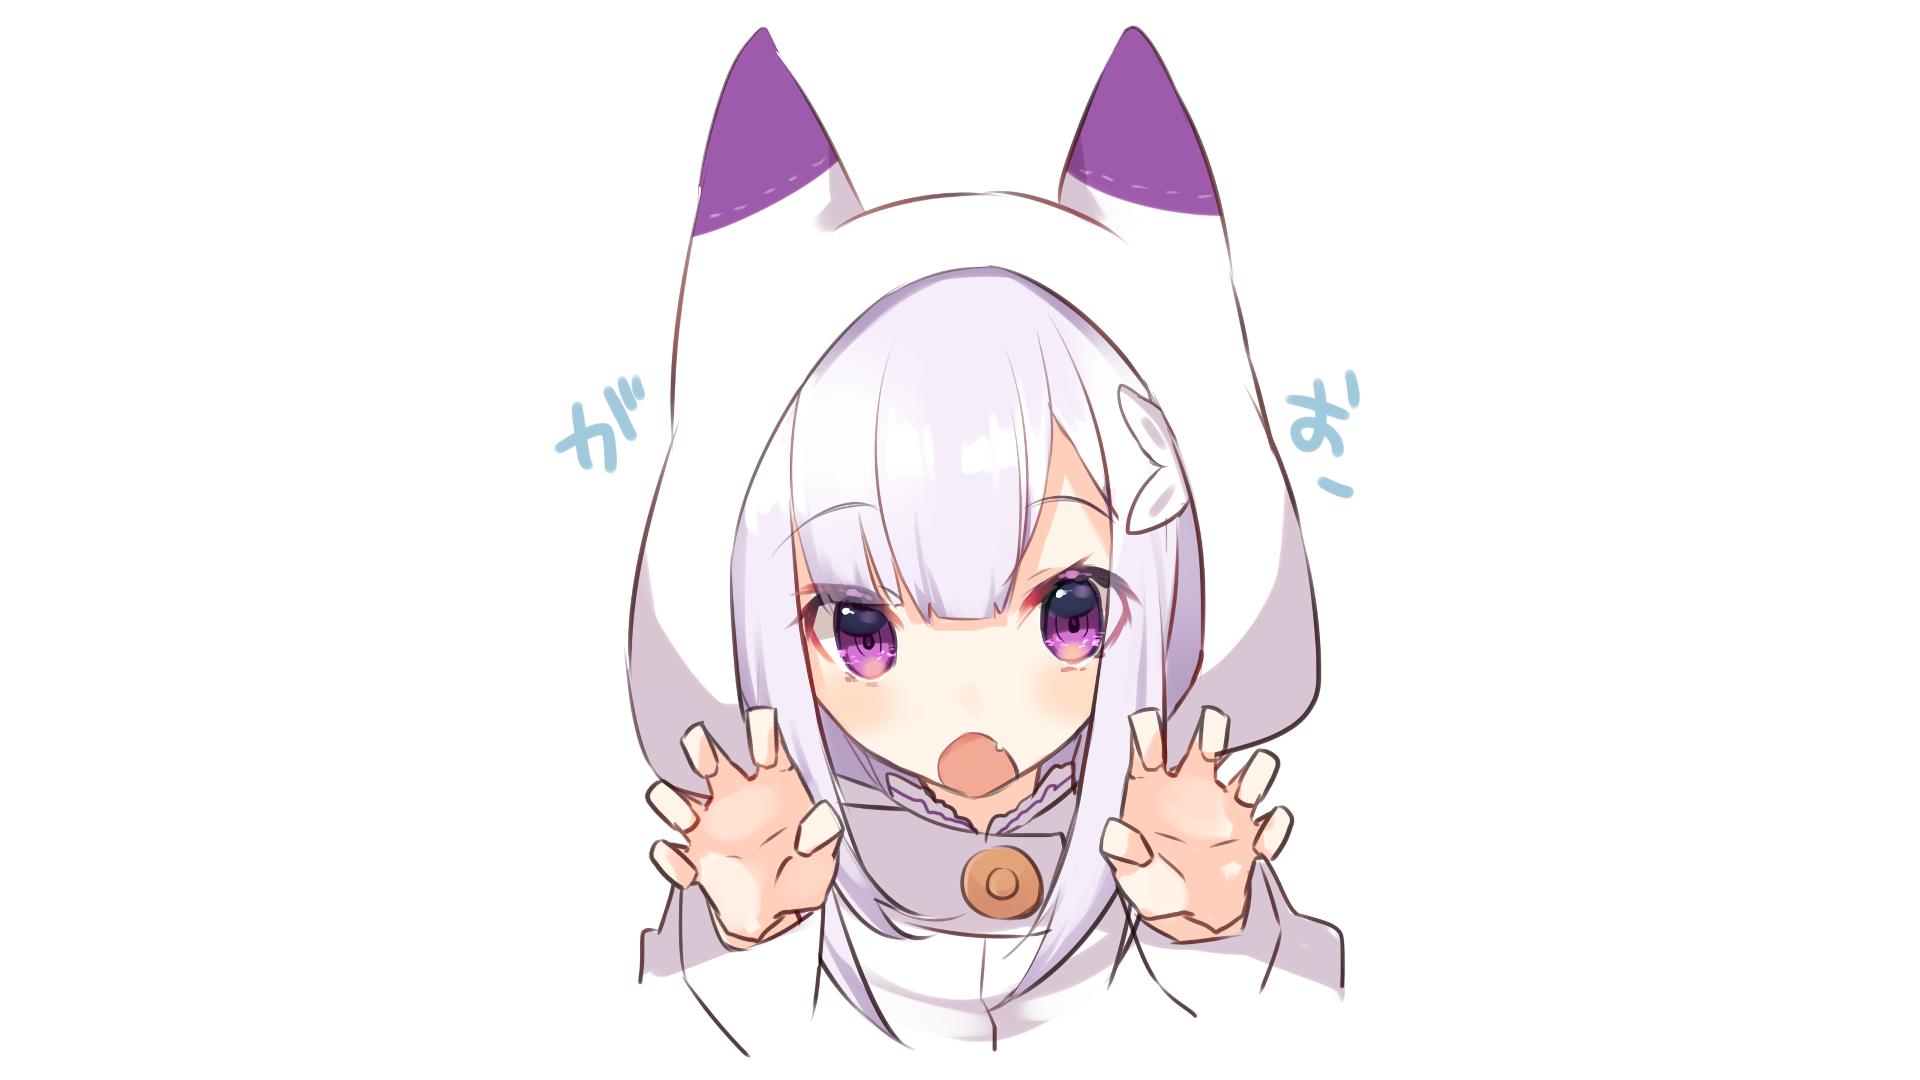 rezero starting life in another world hd wallpaper